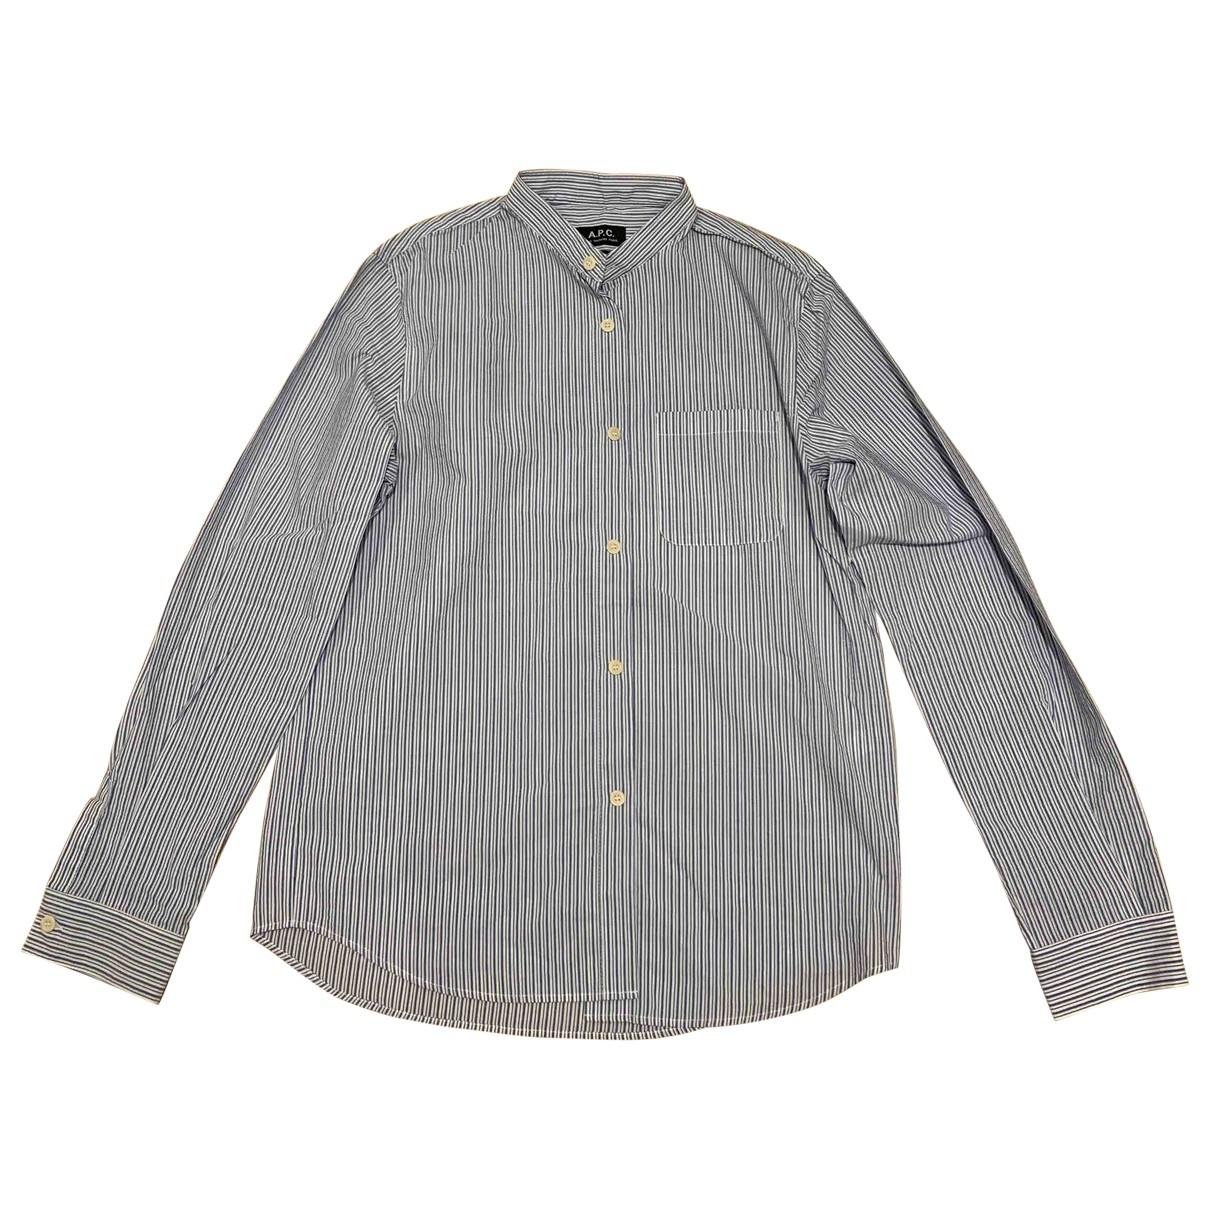 Apc \N Blue Cotton Shirts for Men M International